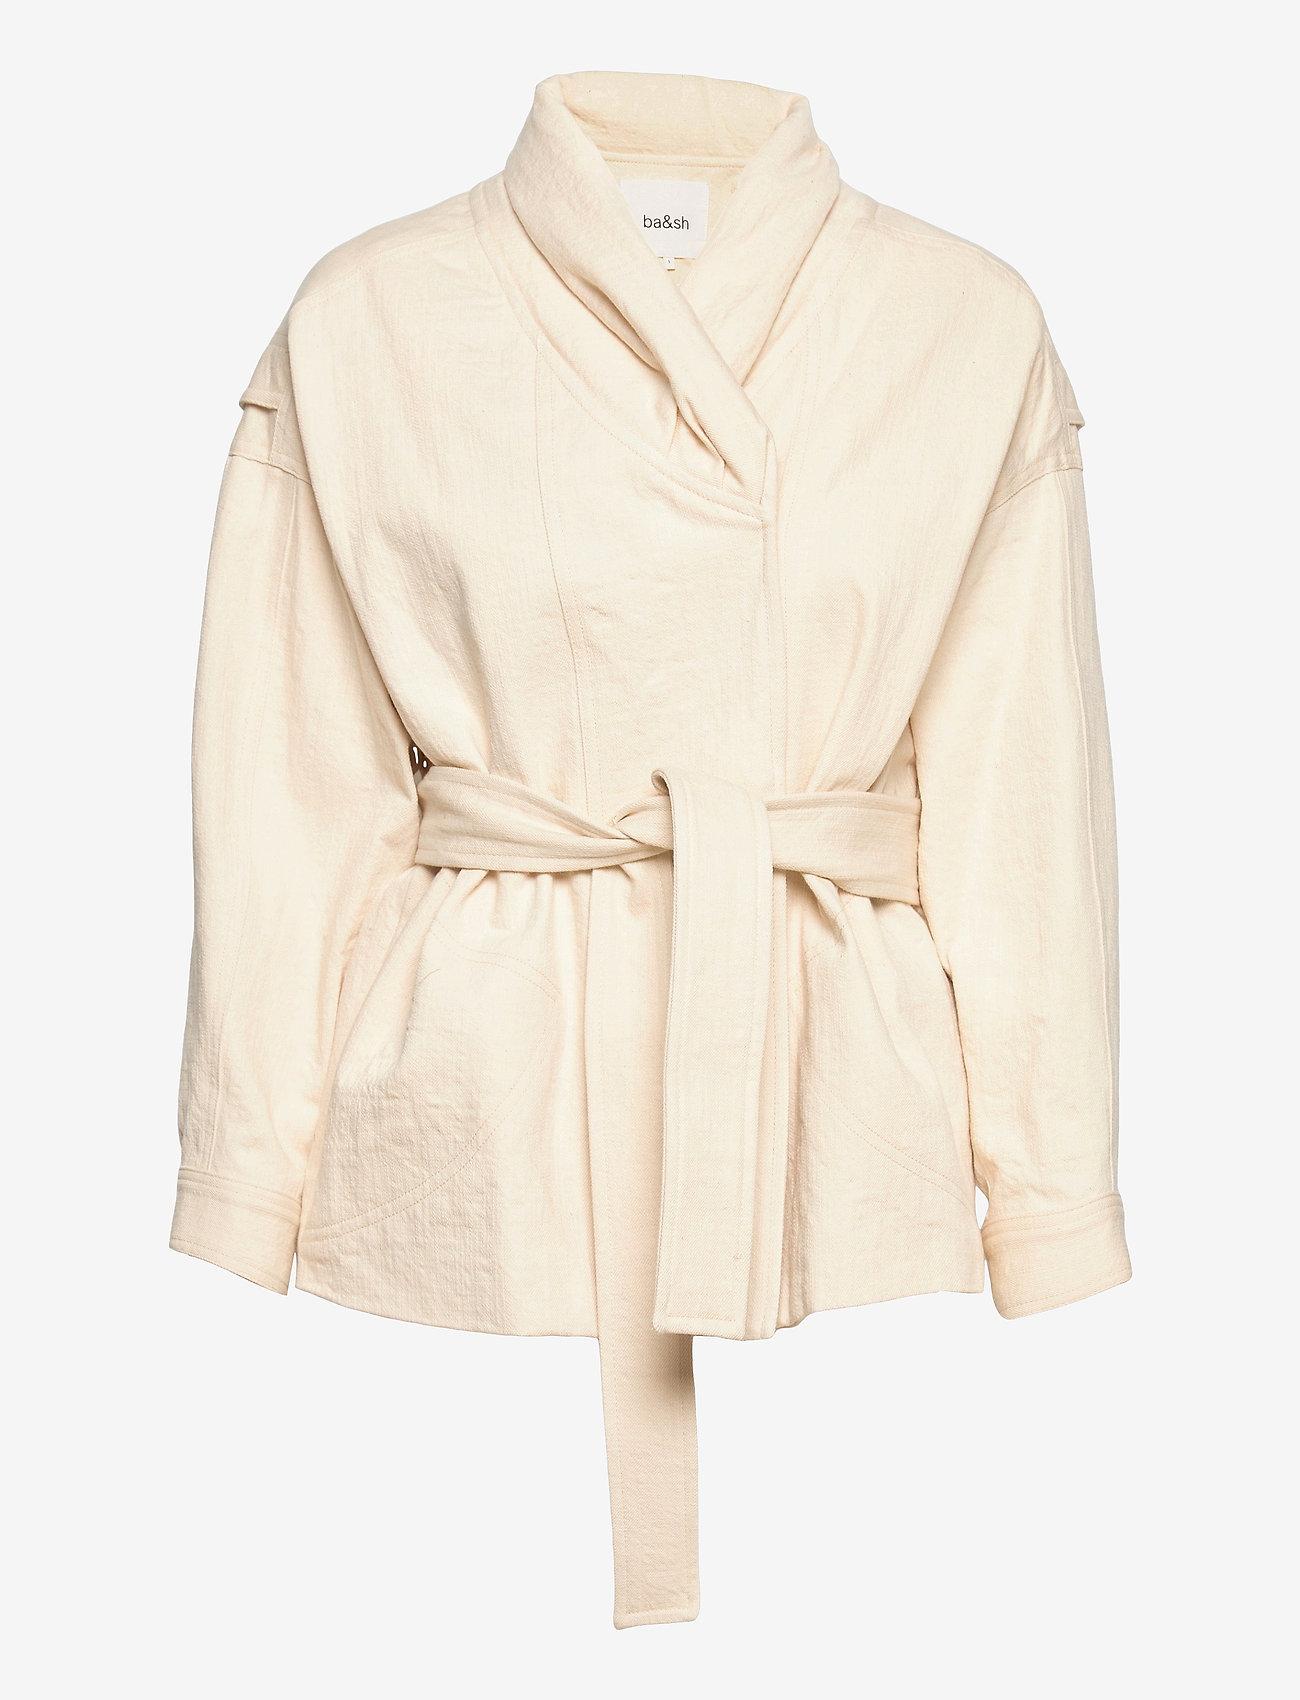 ba&sh - LOST JACKET - wool jackets - off white - 1